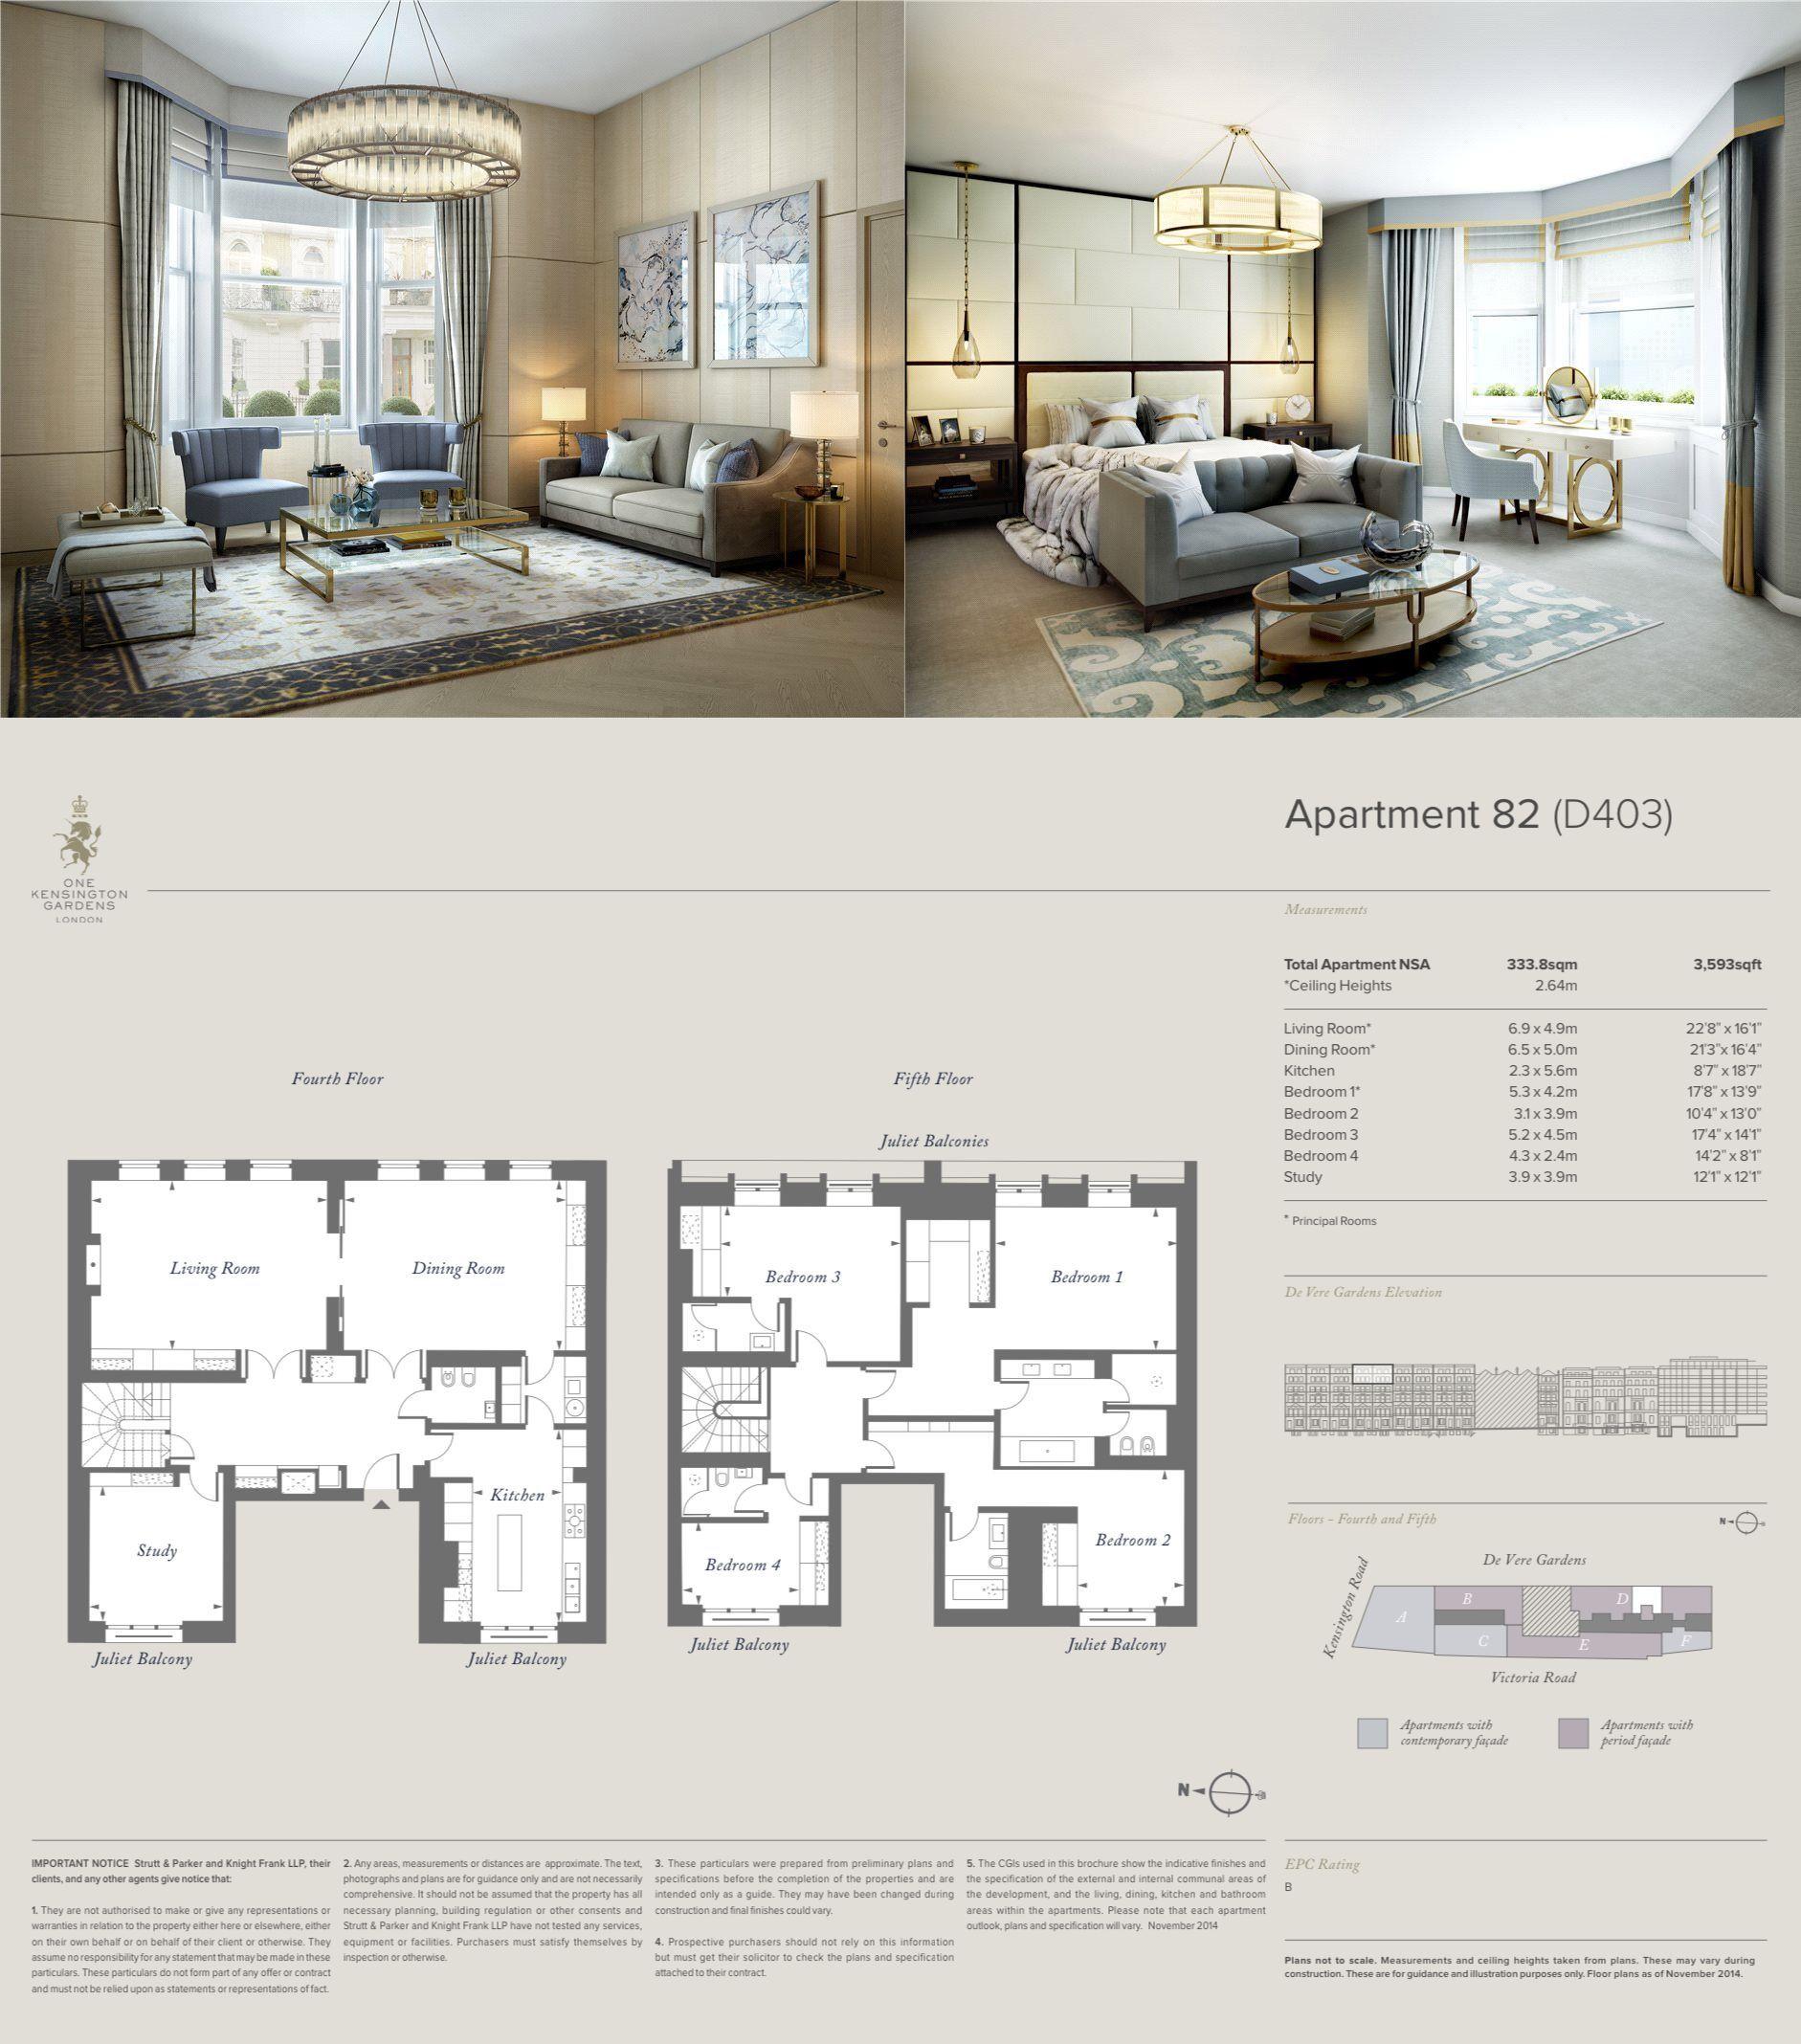 916cf56221a40c3061cd5b5d39fa0234 - London House Hotel Kensington 81 Kensington Gardens Square